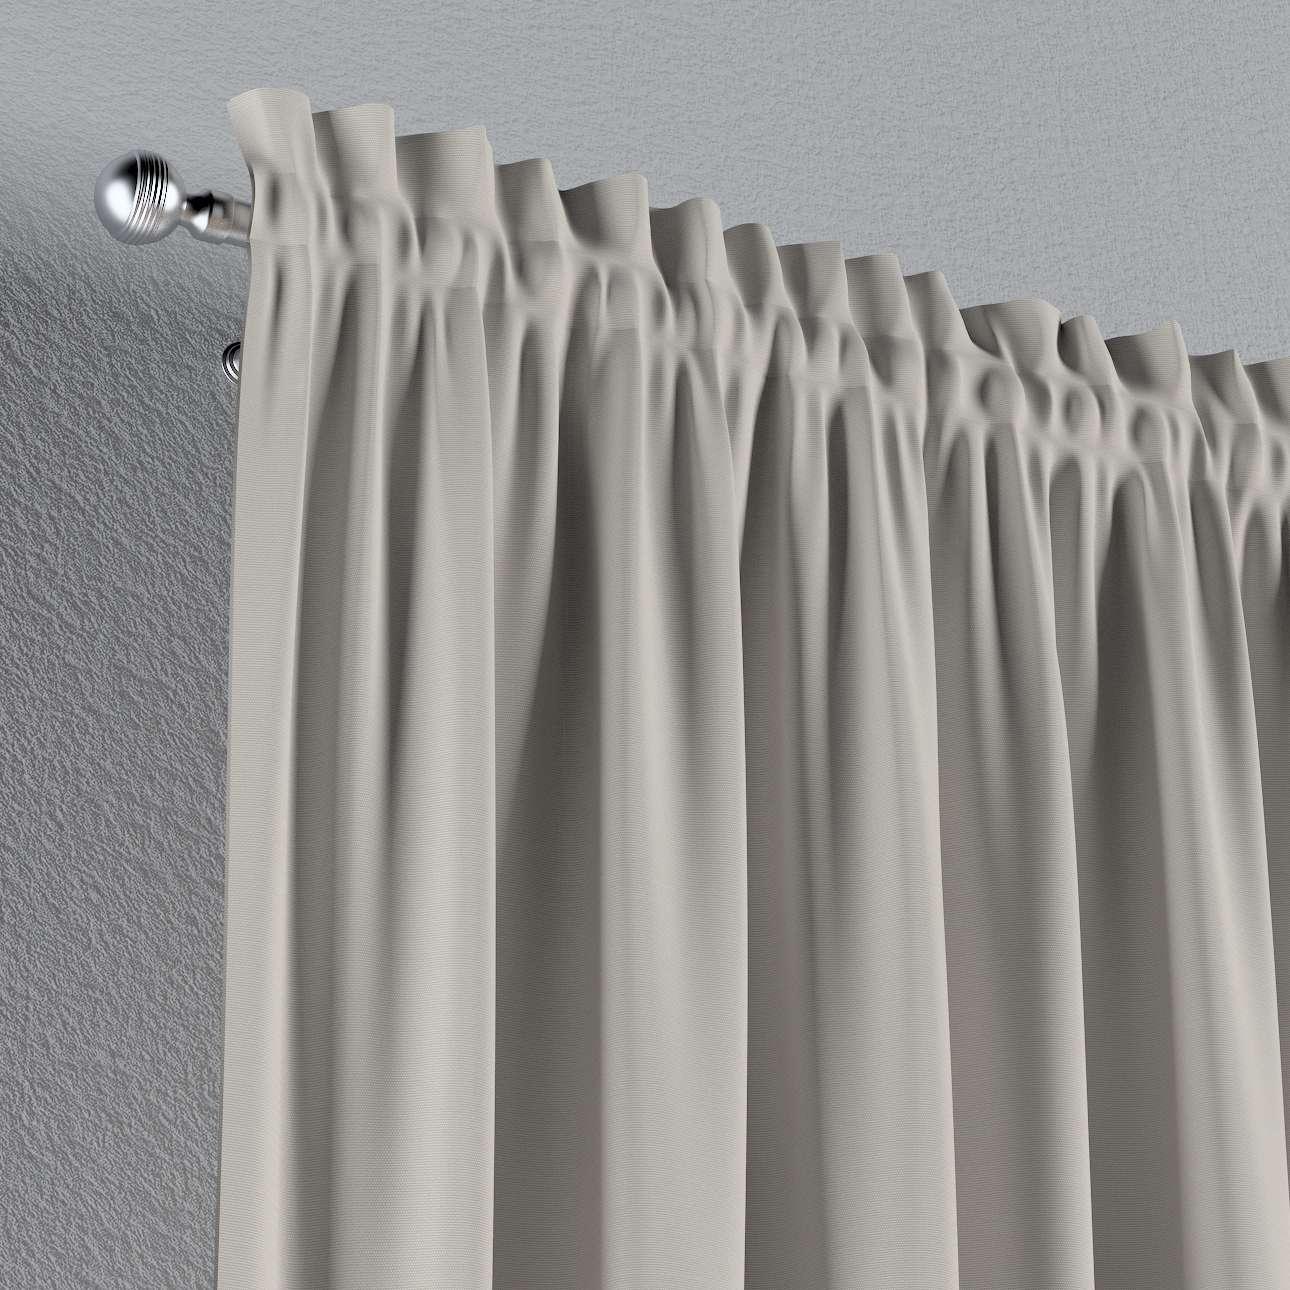 Gardin med kanal - Multiband 1 längd i kollektionen Panama Cotton, Tyg: 702-31